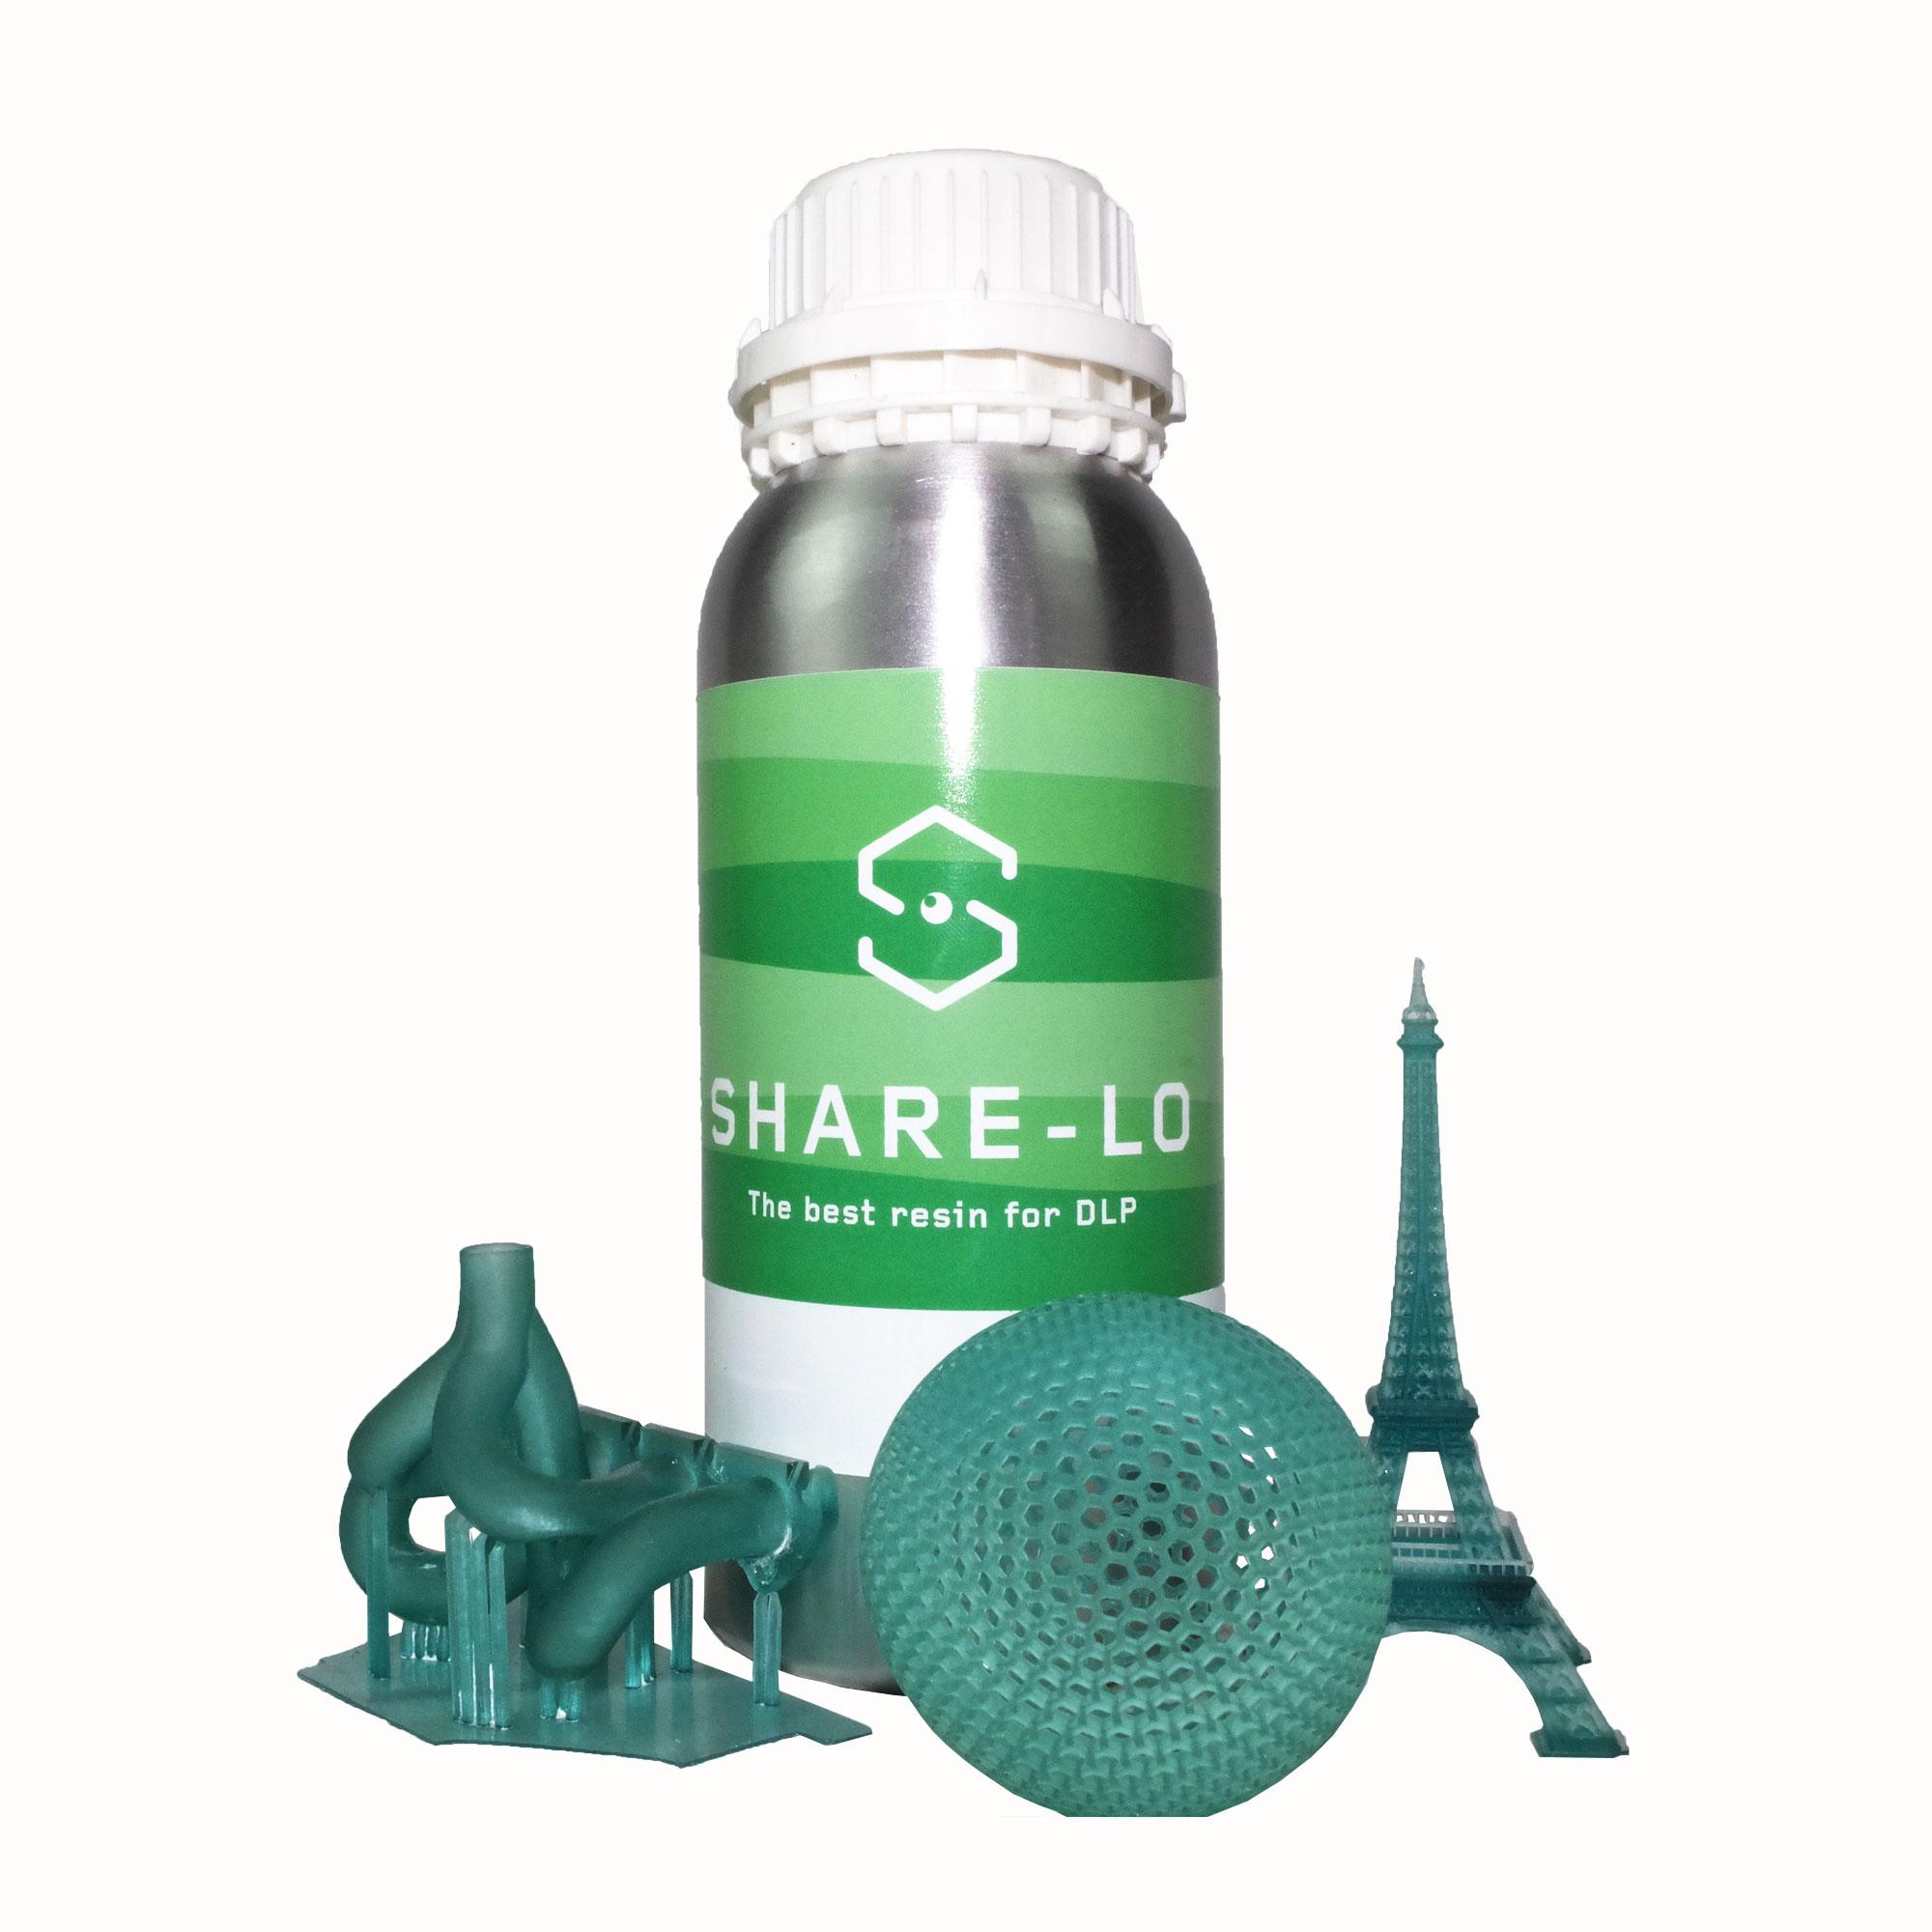 stampante 3d resina sharebot spirit sharebot monza